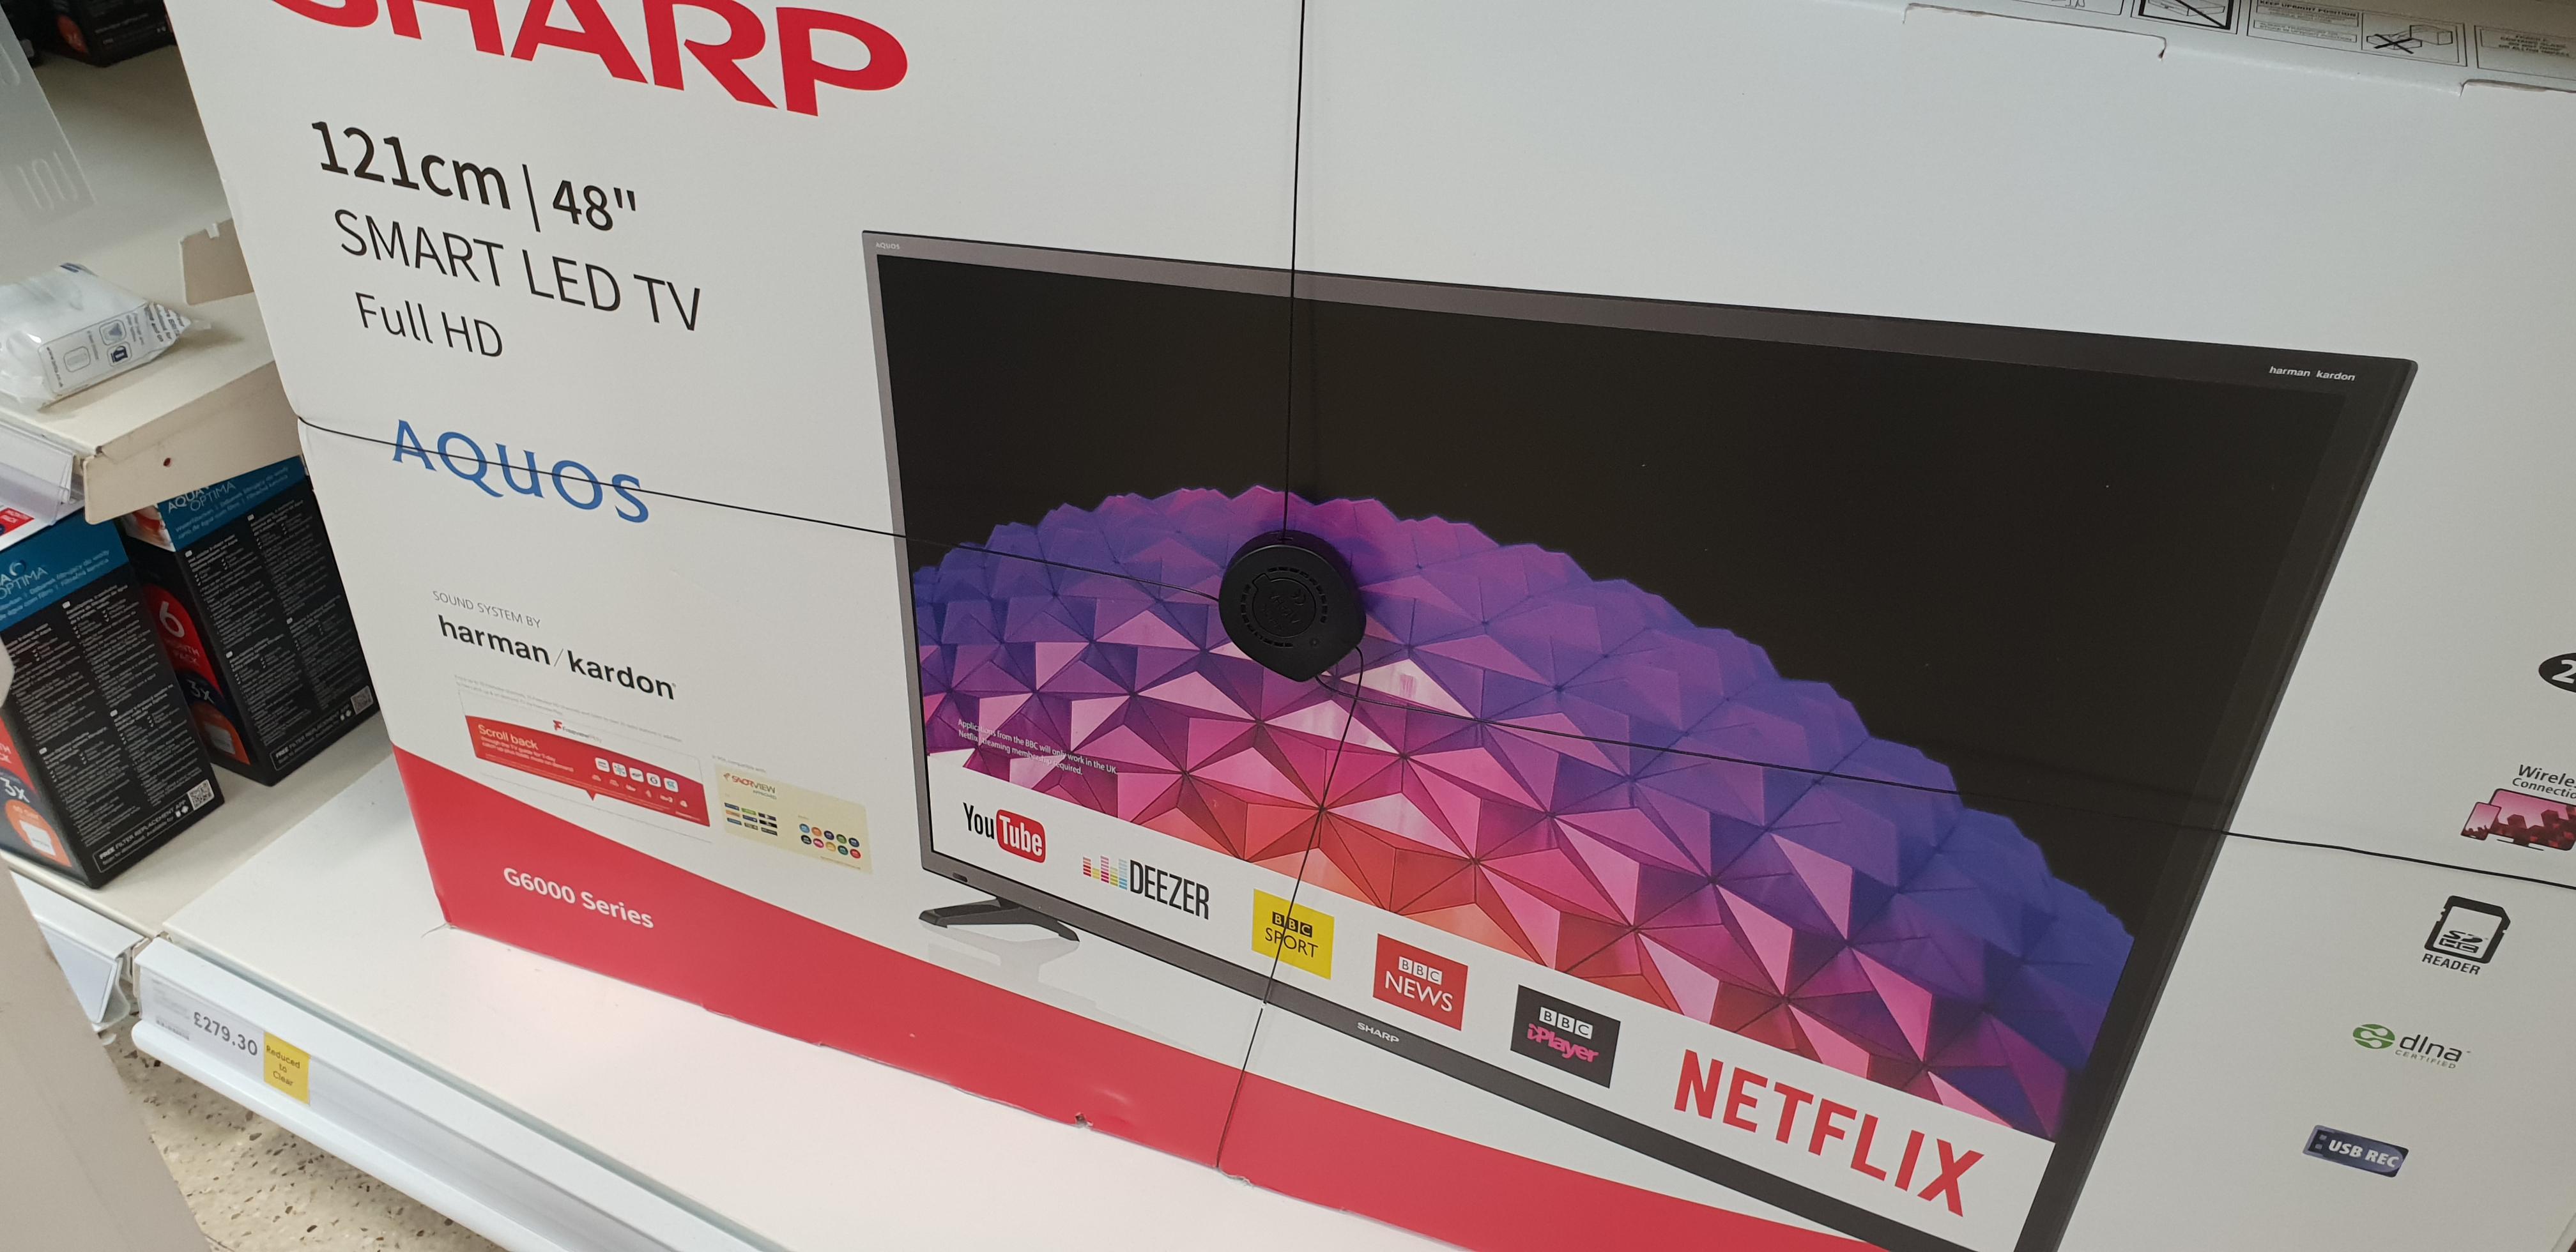 SHARP Aquos LC-48fg6001kf 48inch Smart LED HD TV £279.30 @ Tesco instore